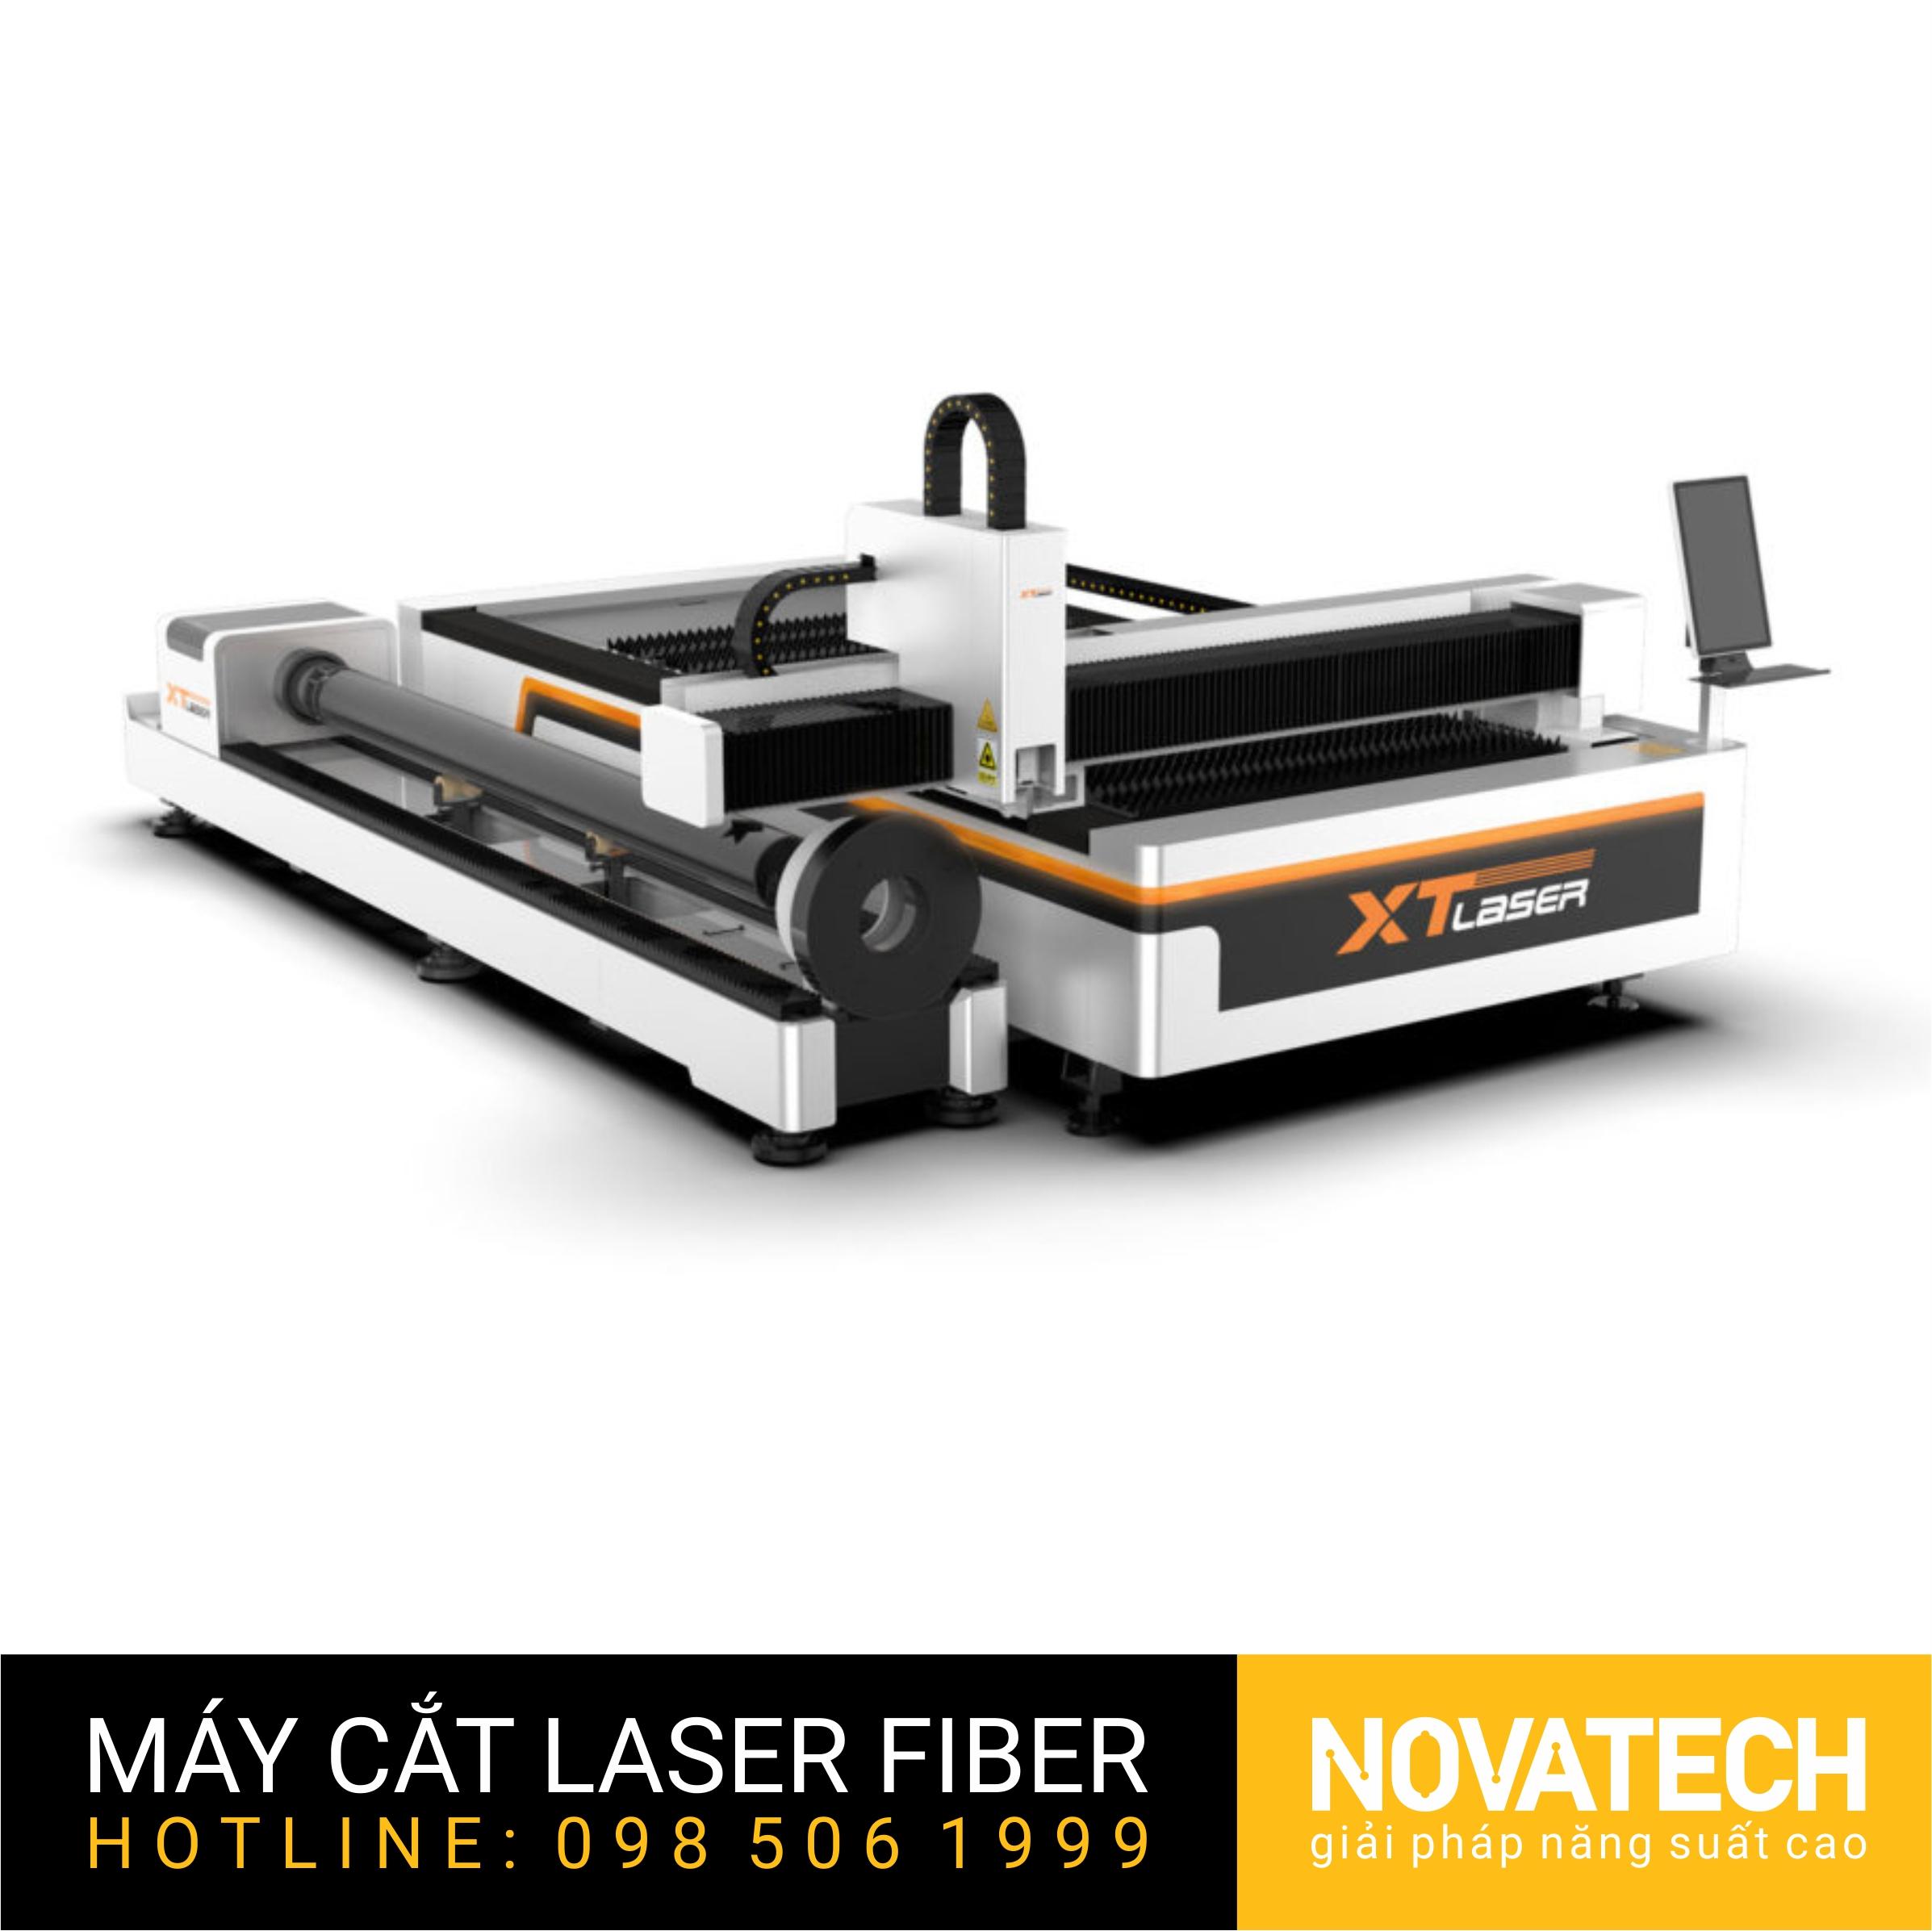 Máy cắt laser fiber bàn đôi XT-Laser HT Series